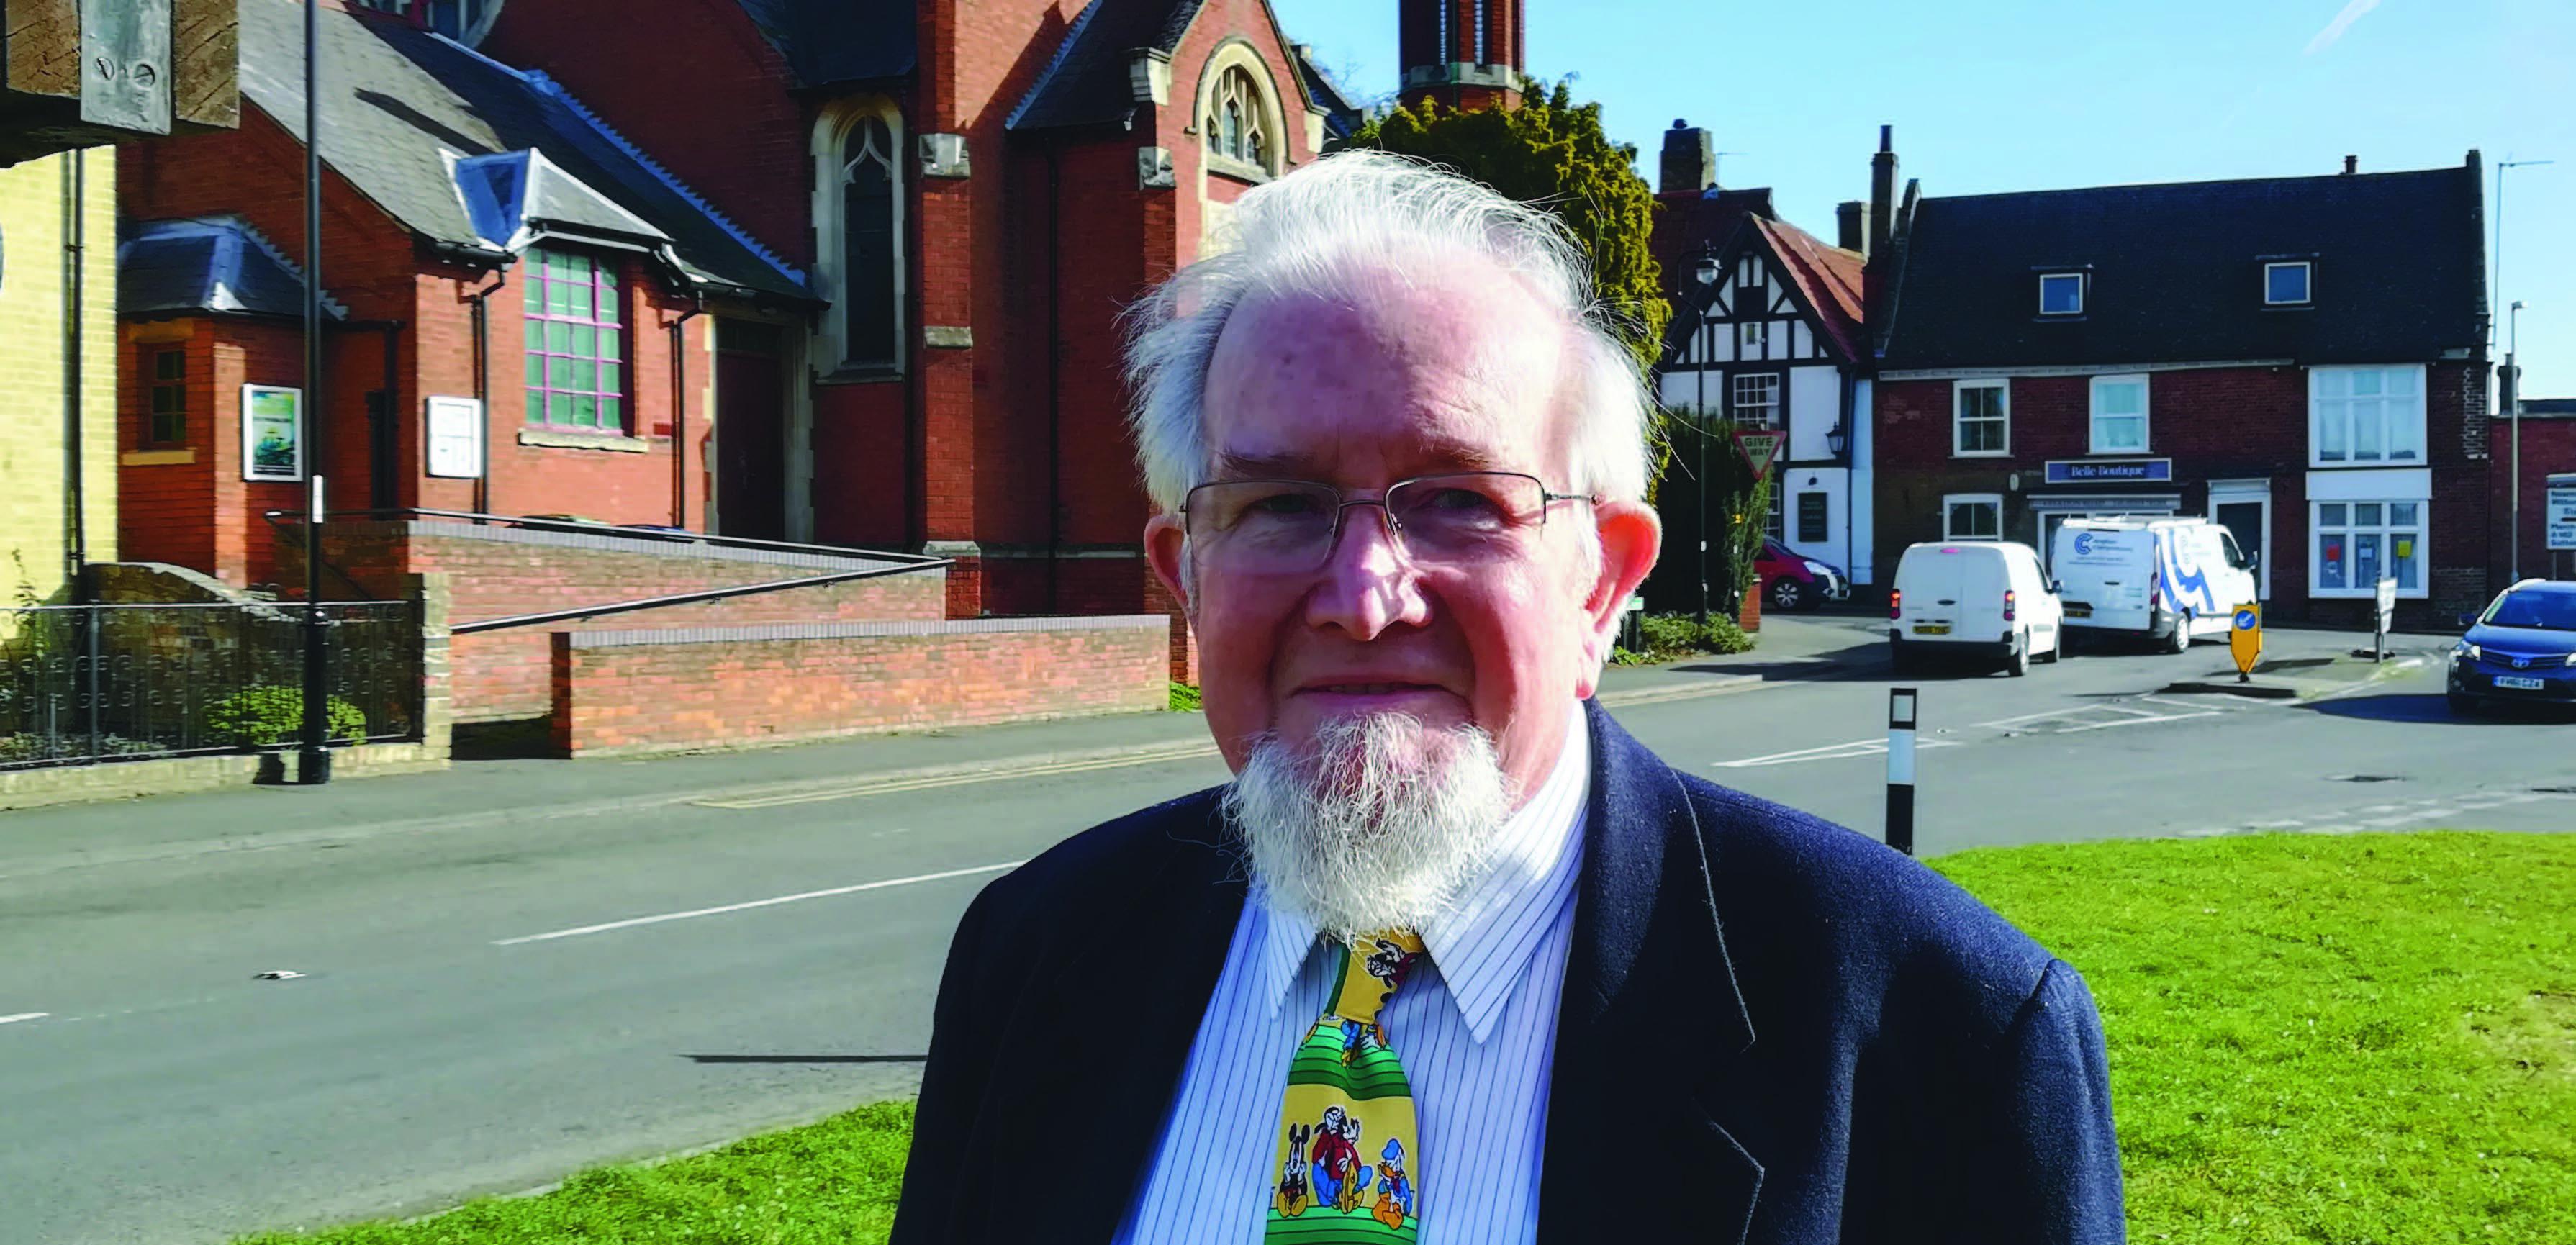 Greth Wilson Candidate for Haddenham